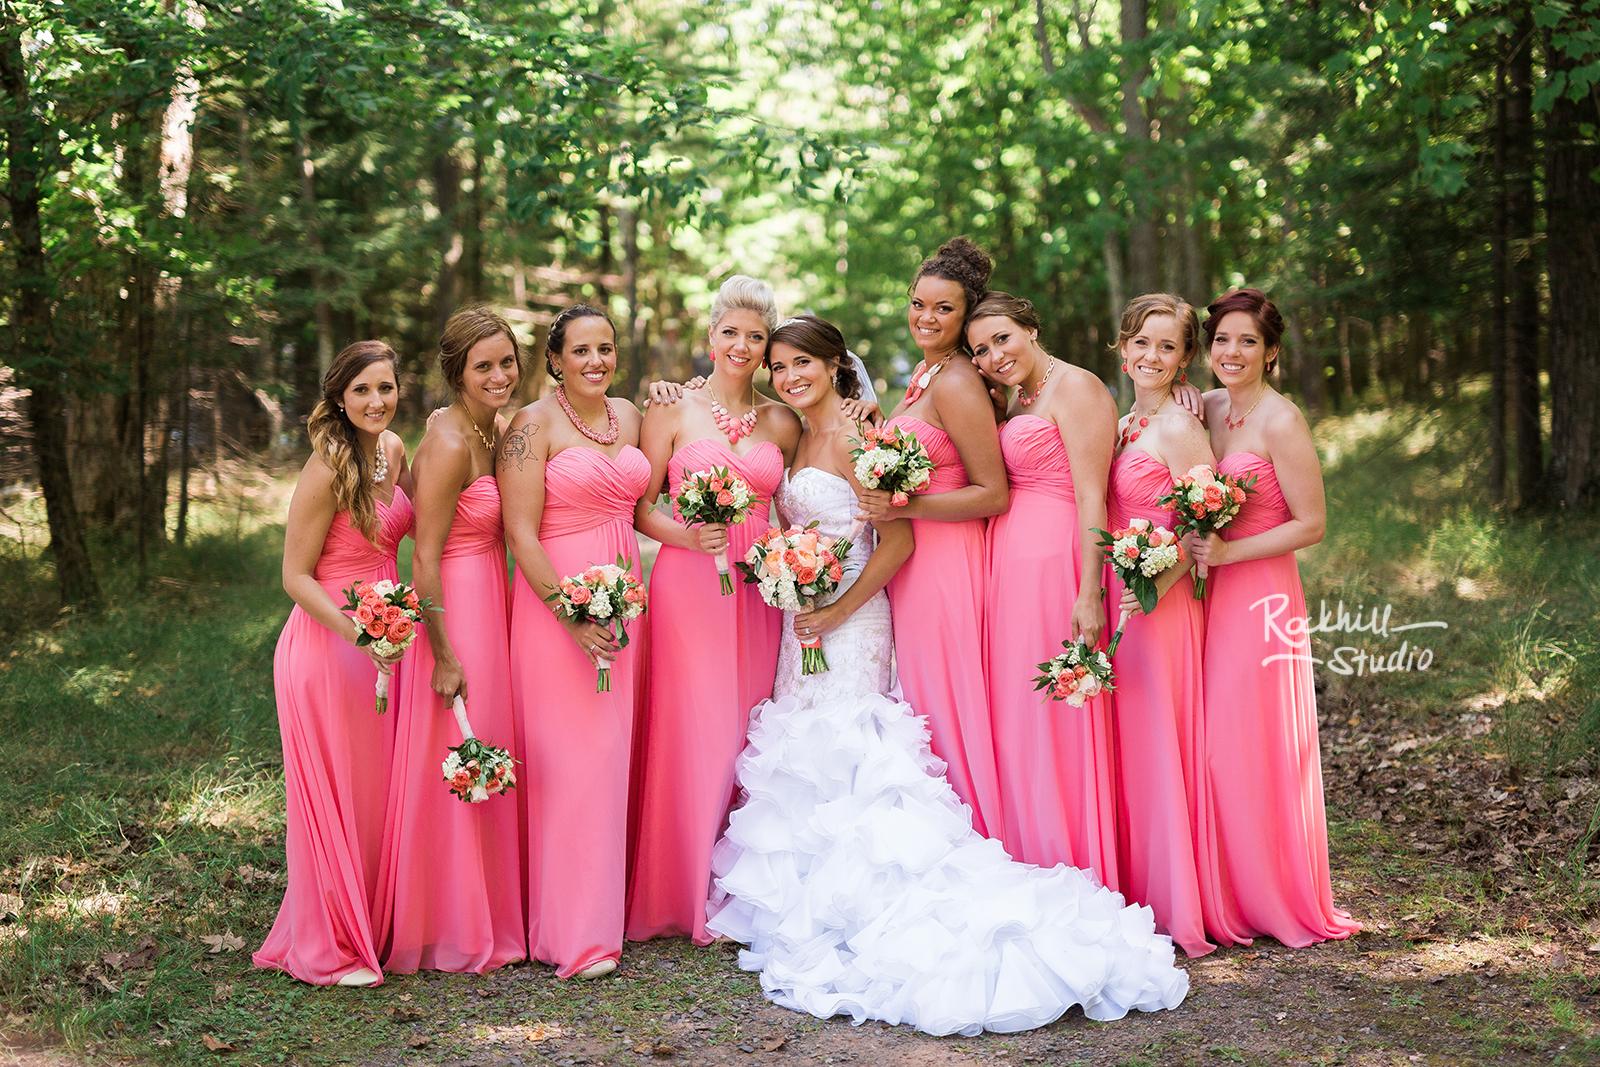 marquette-wedding-upper-peninsula-northern-michigan-wedding-ck-photography-wedding-party-19.jpg